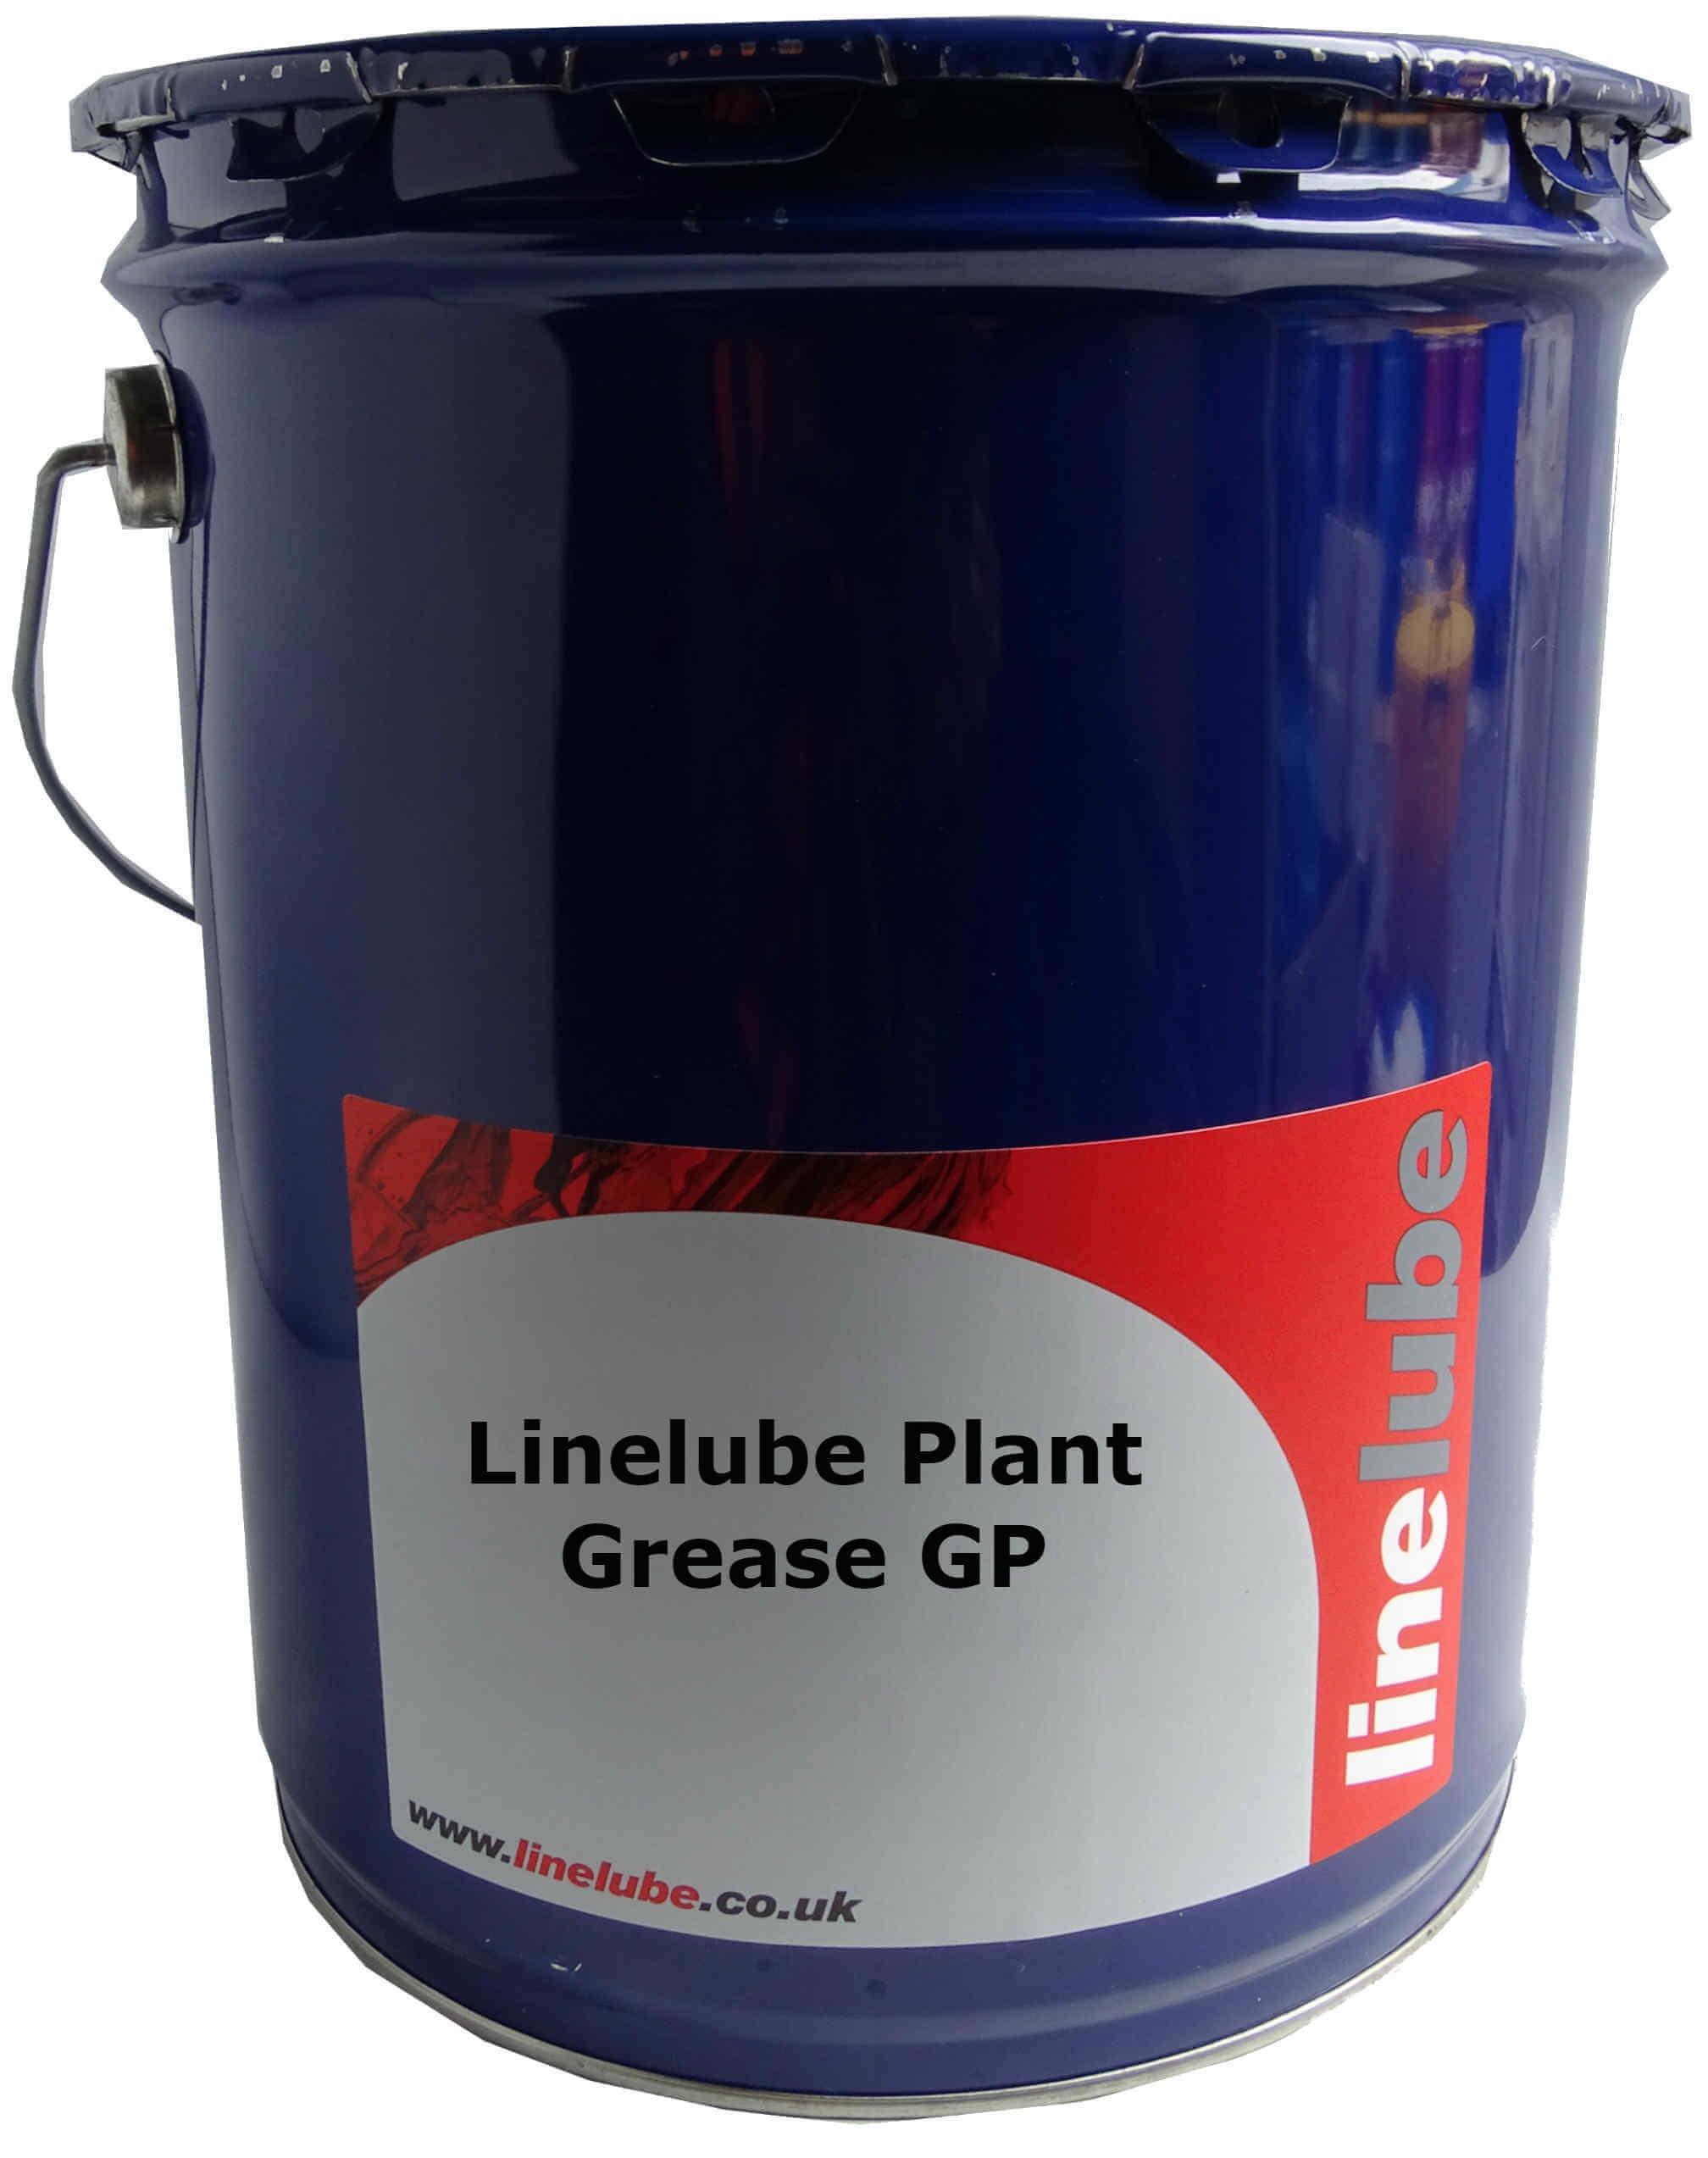 Linelube HD Adhesive Grease